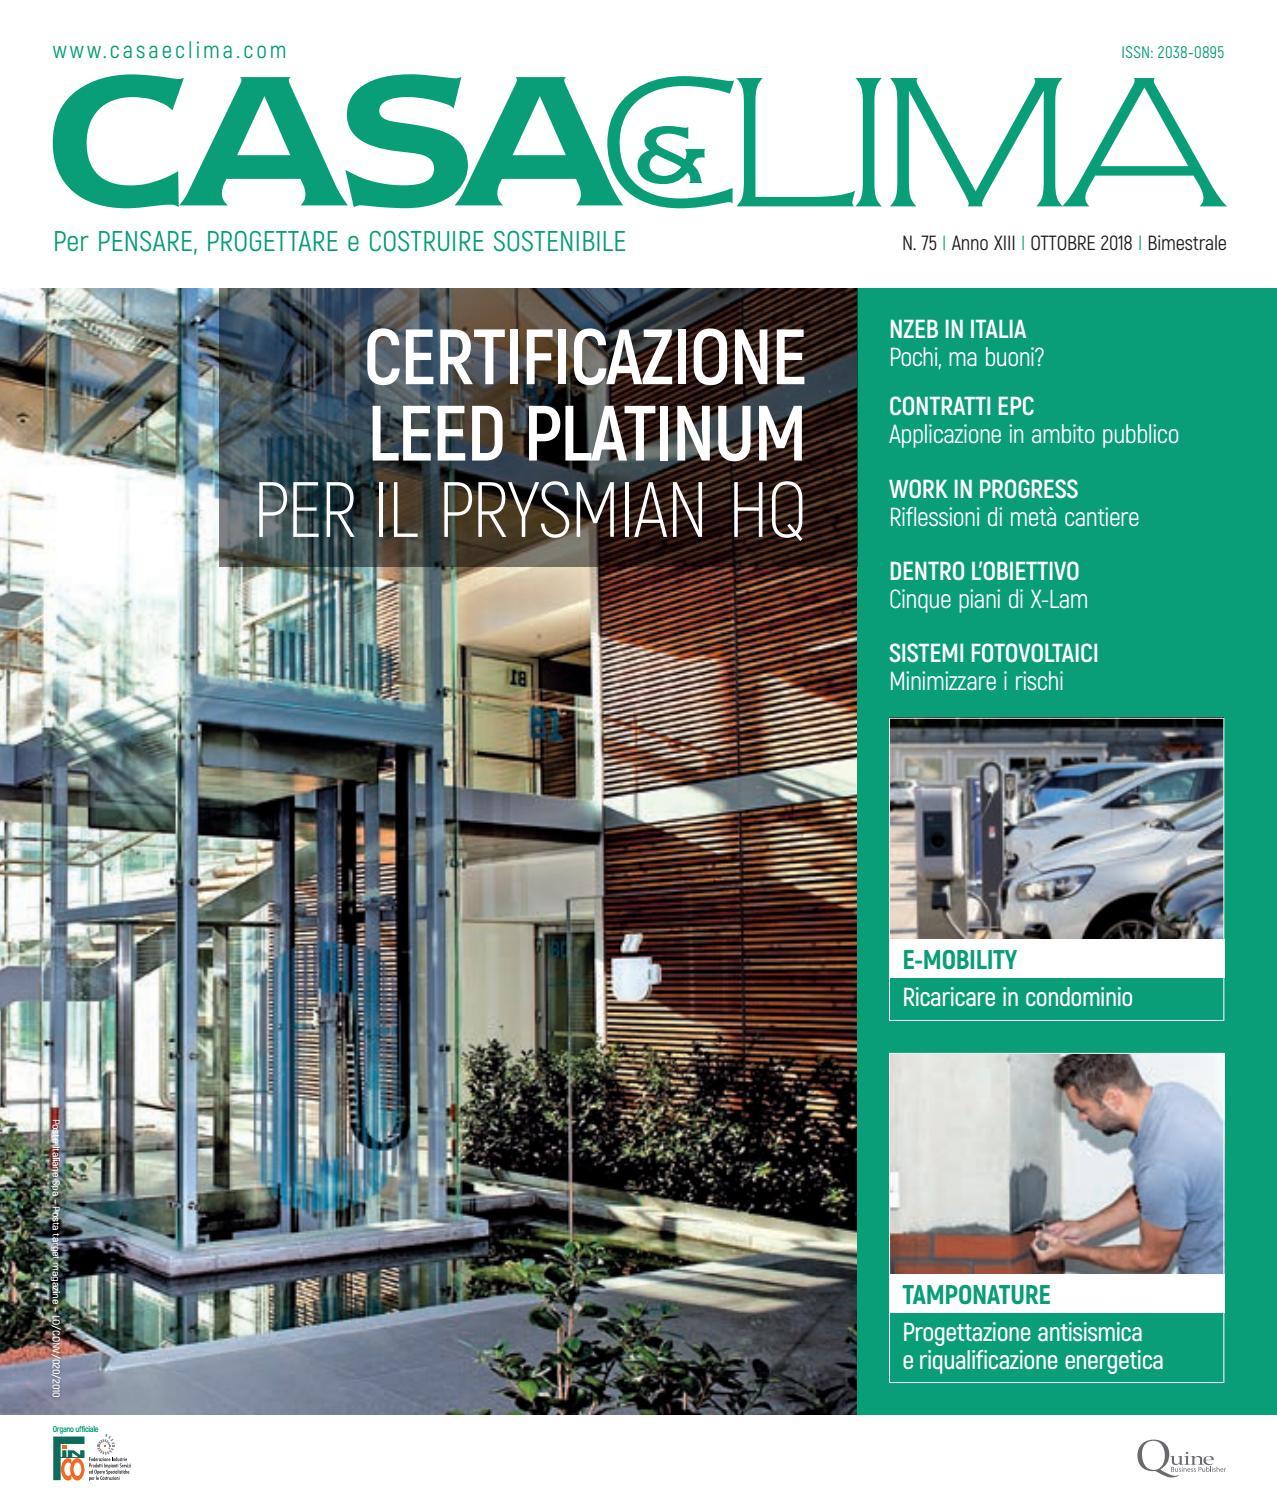 Serra Bioclimatica Normativa Lombardia casa&clima #75 by quine business publisher - issuu